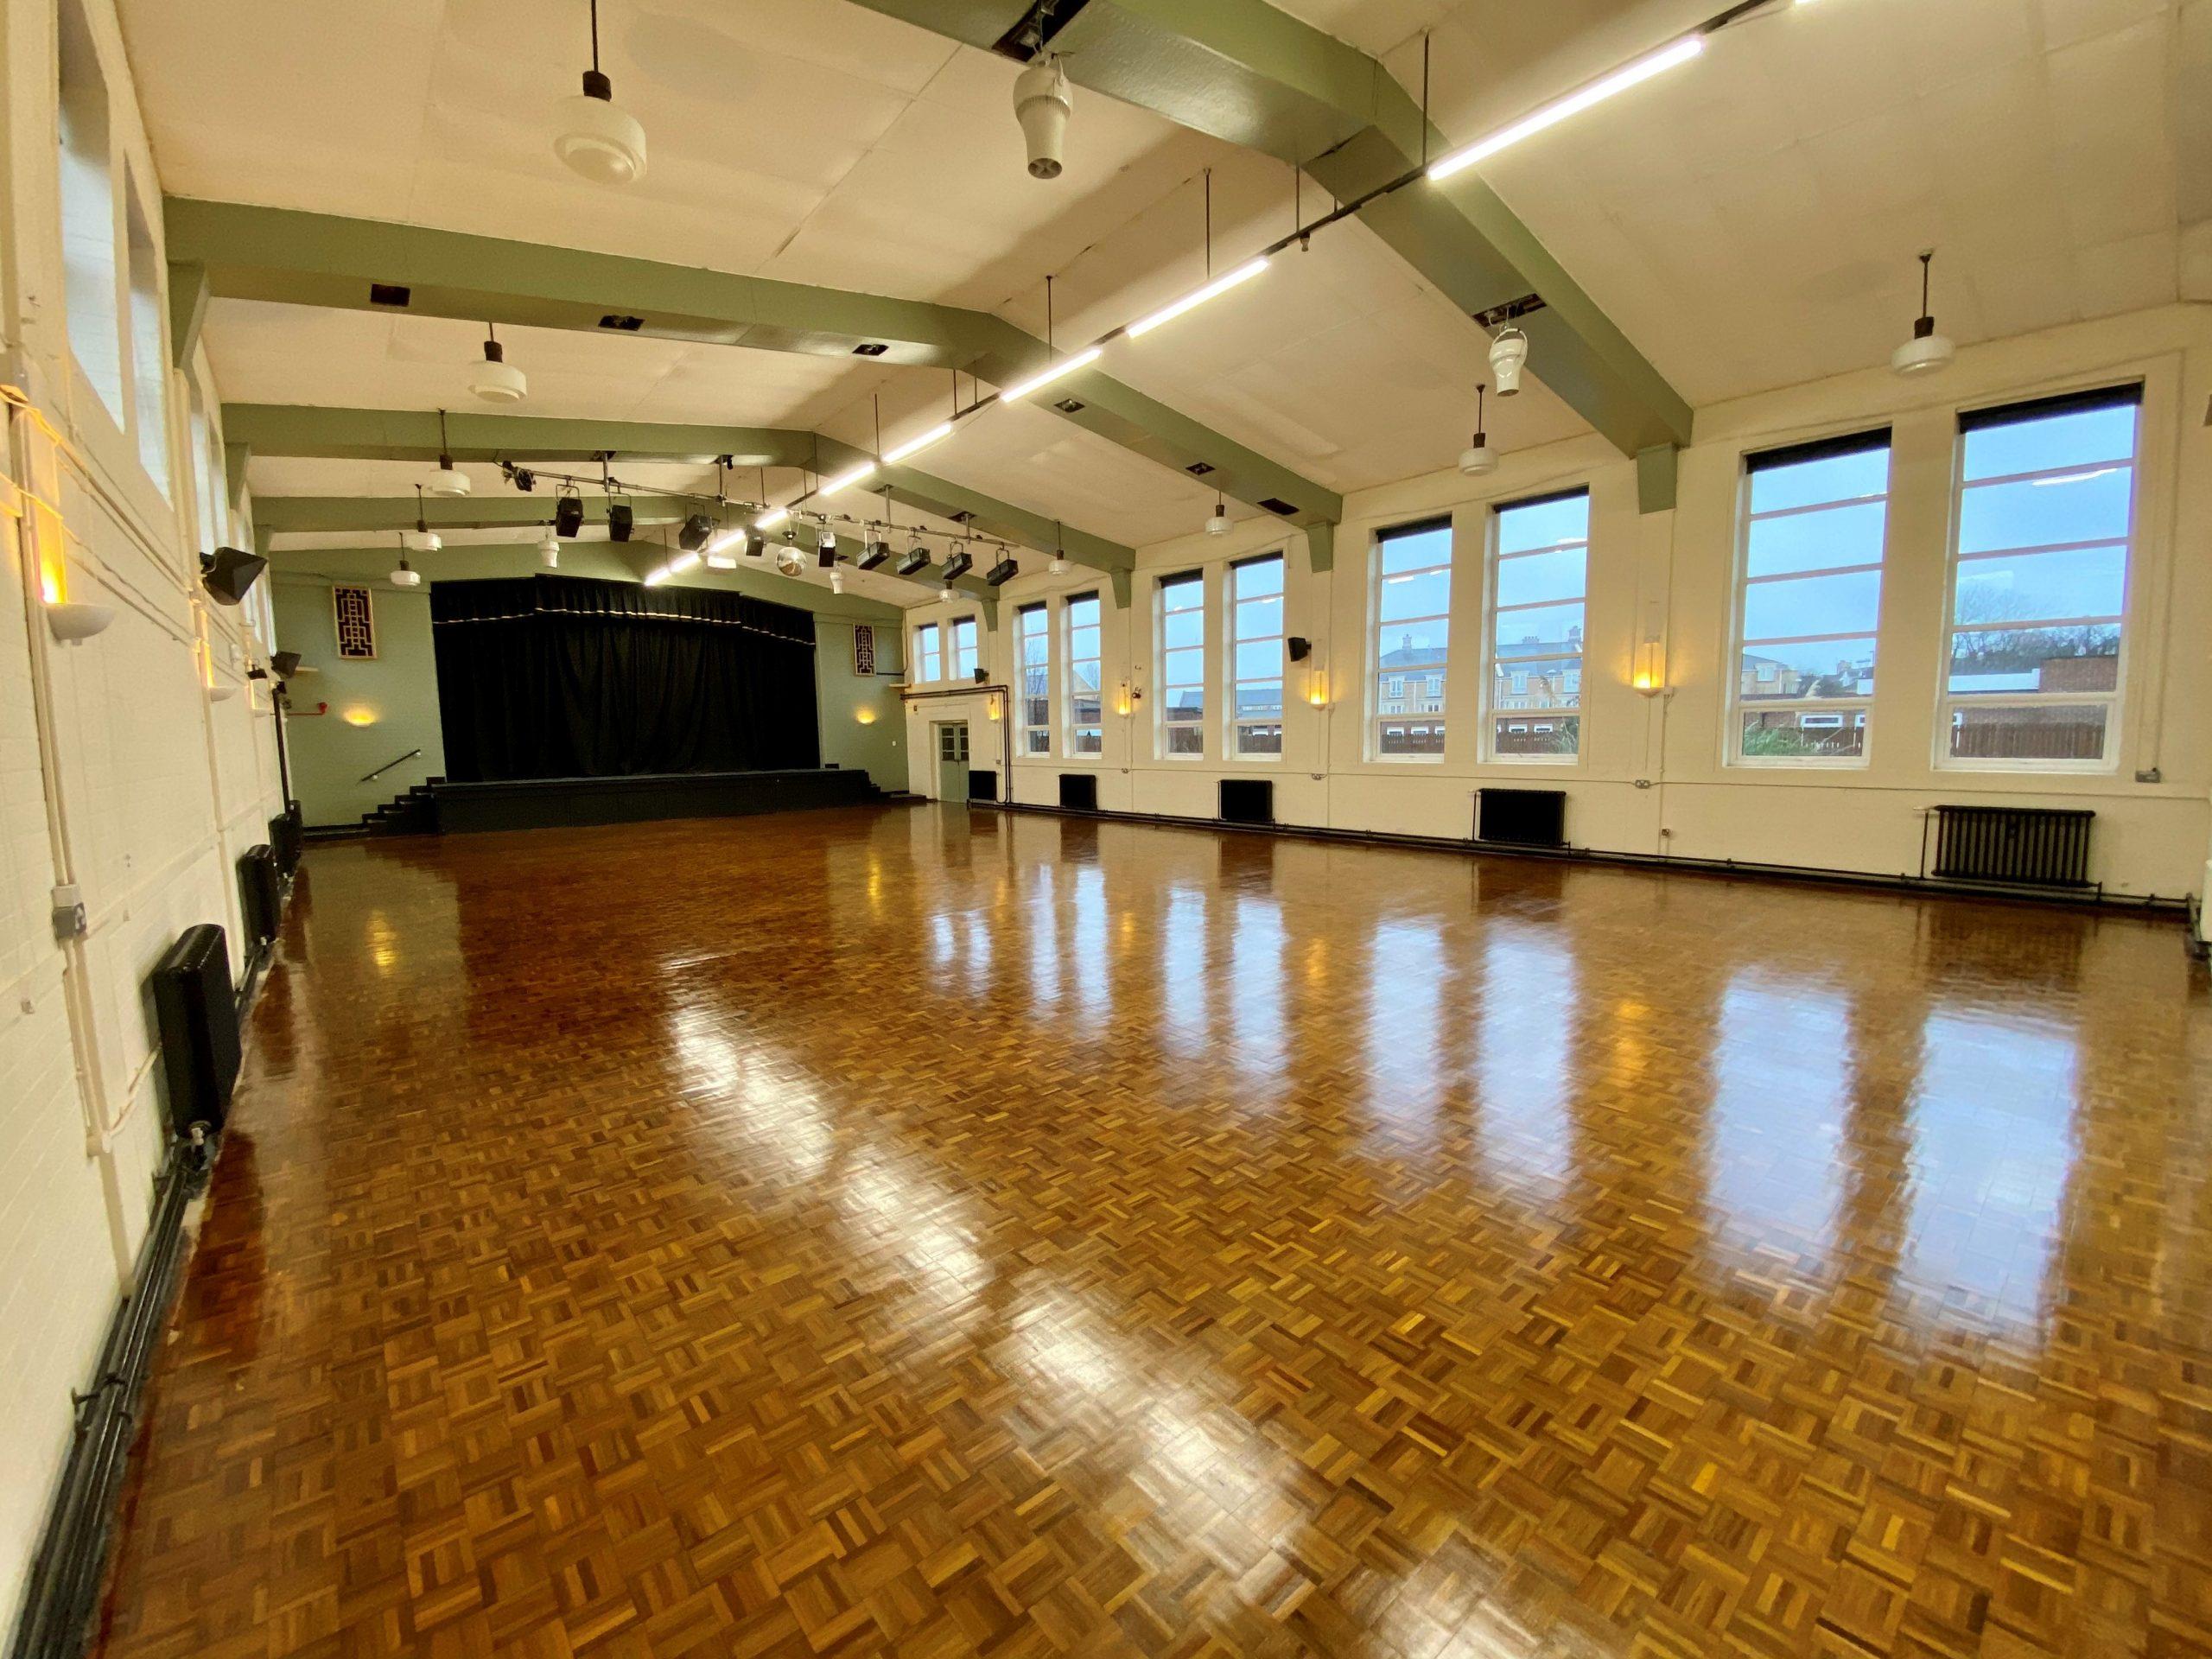 Trevelyan Hall is looking splendid